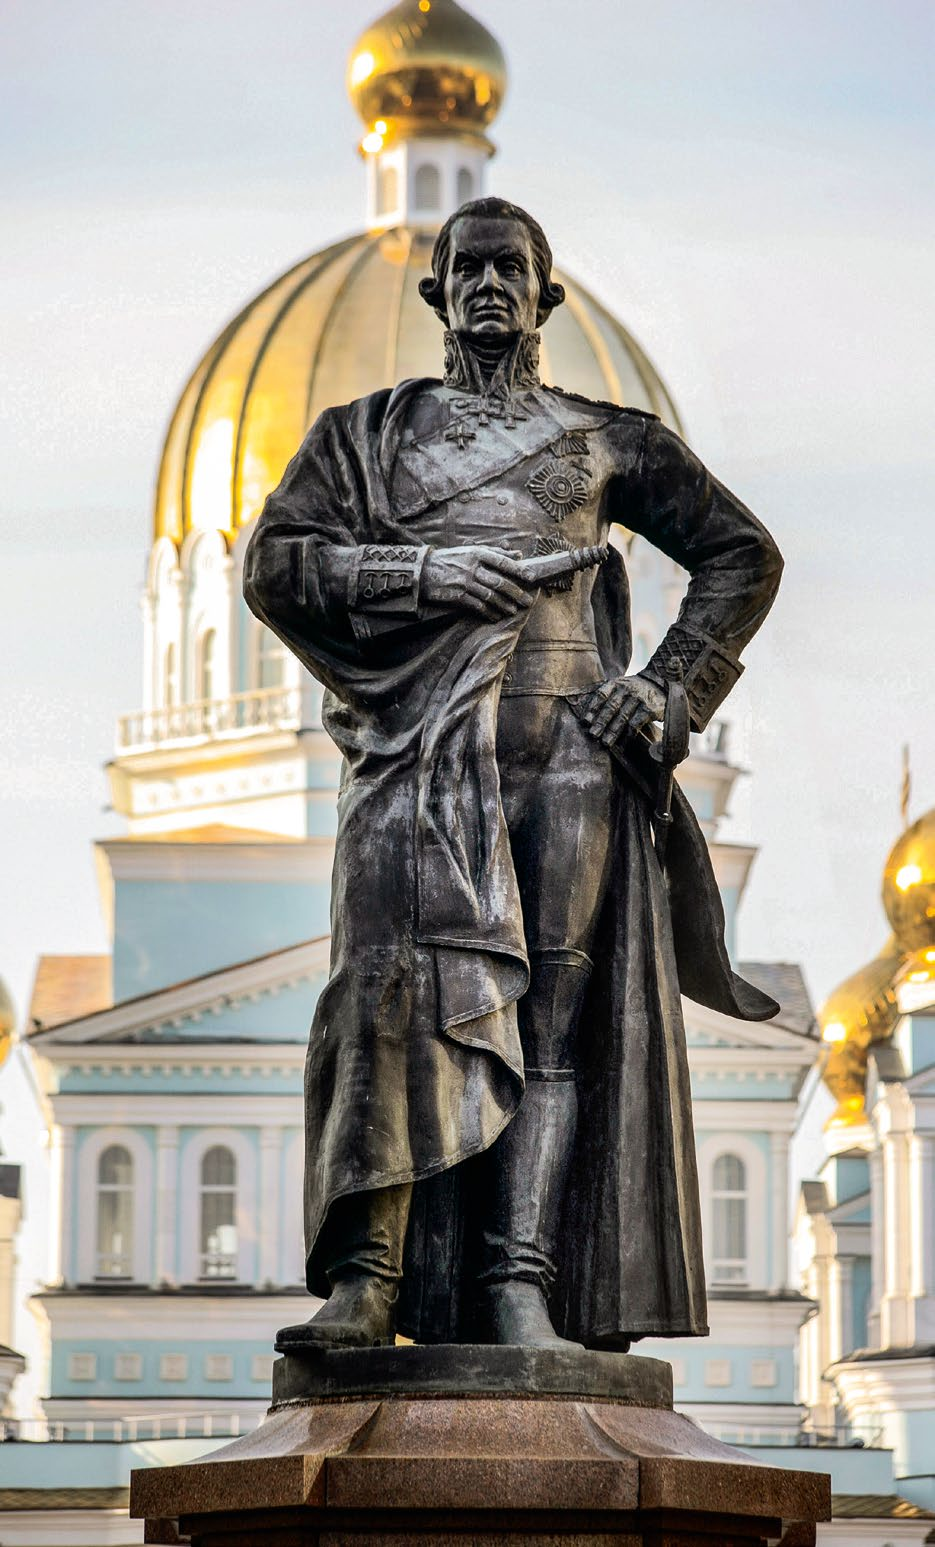 Памятник адмиралу Федору Ушакову в Саранске